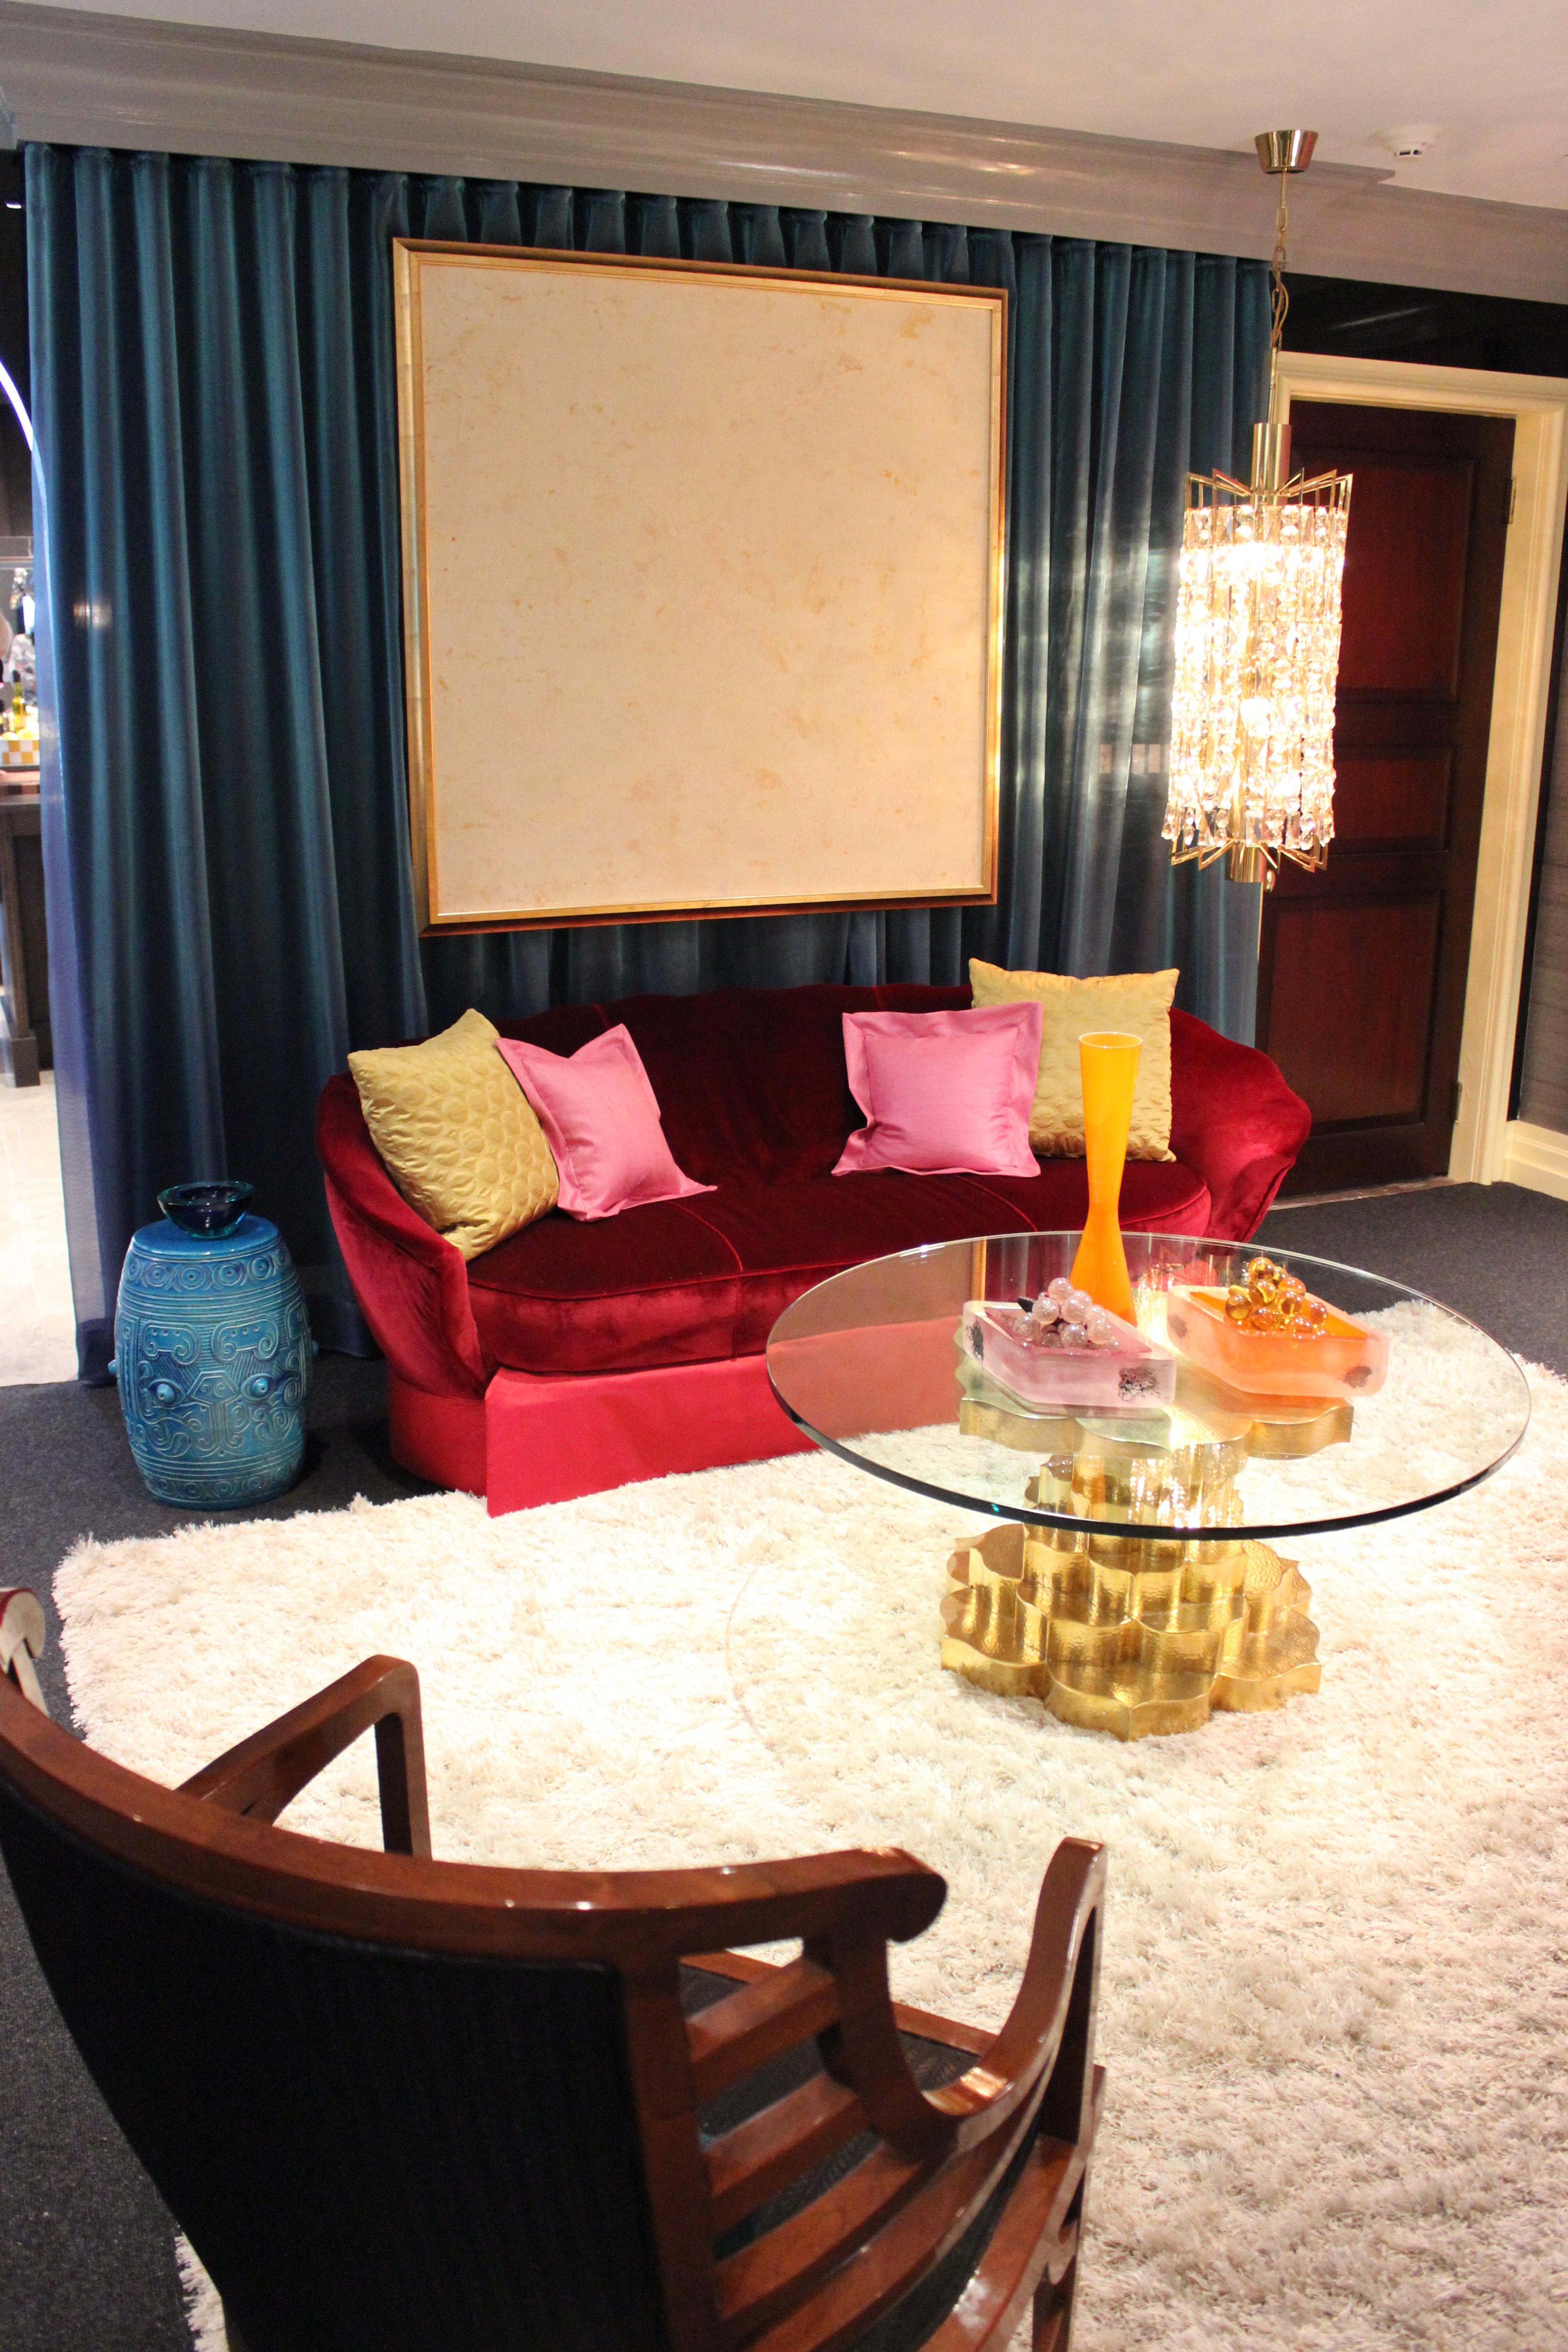 Kips Bay Decorator Show House 2013 Decoratorsbest Blog